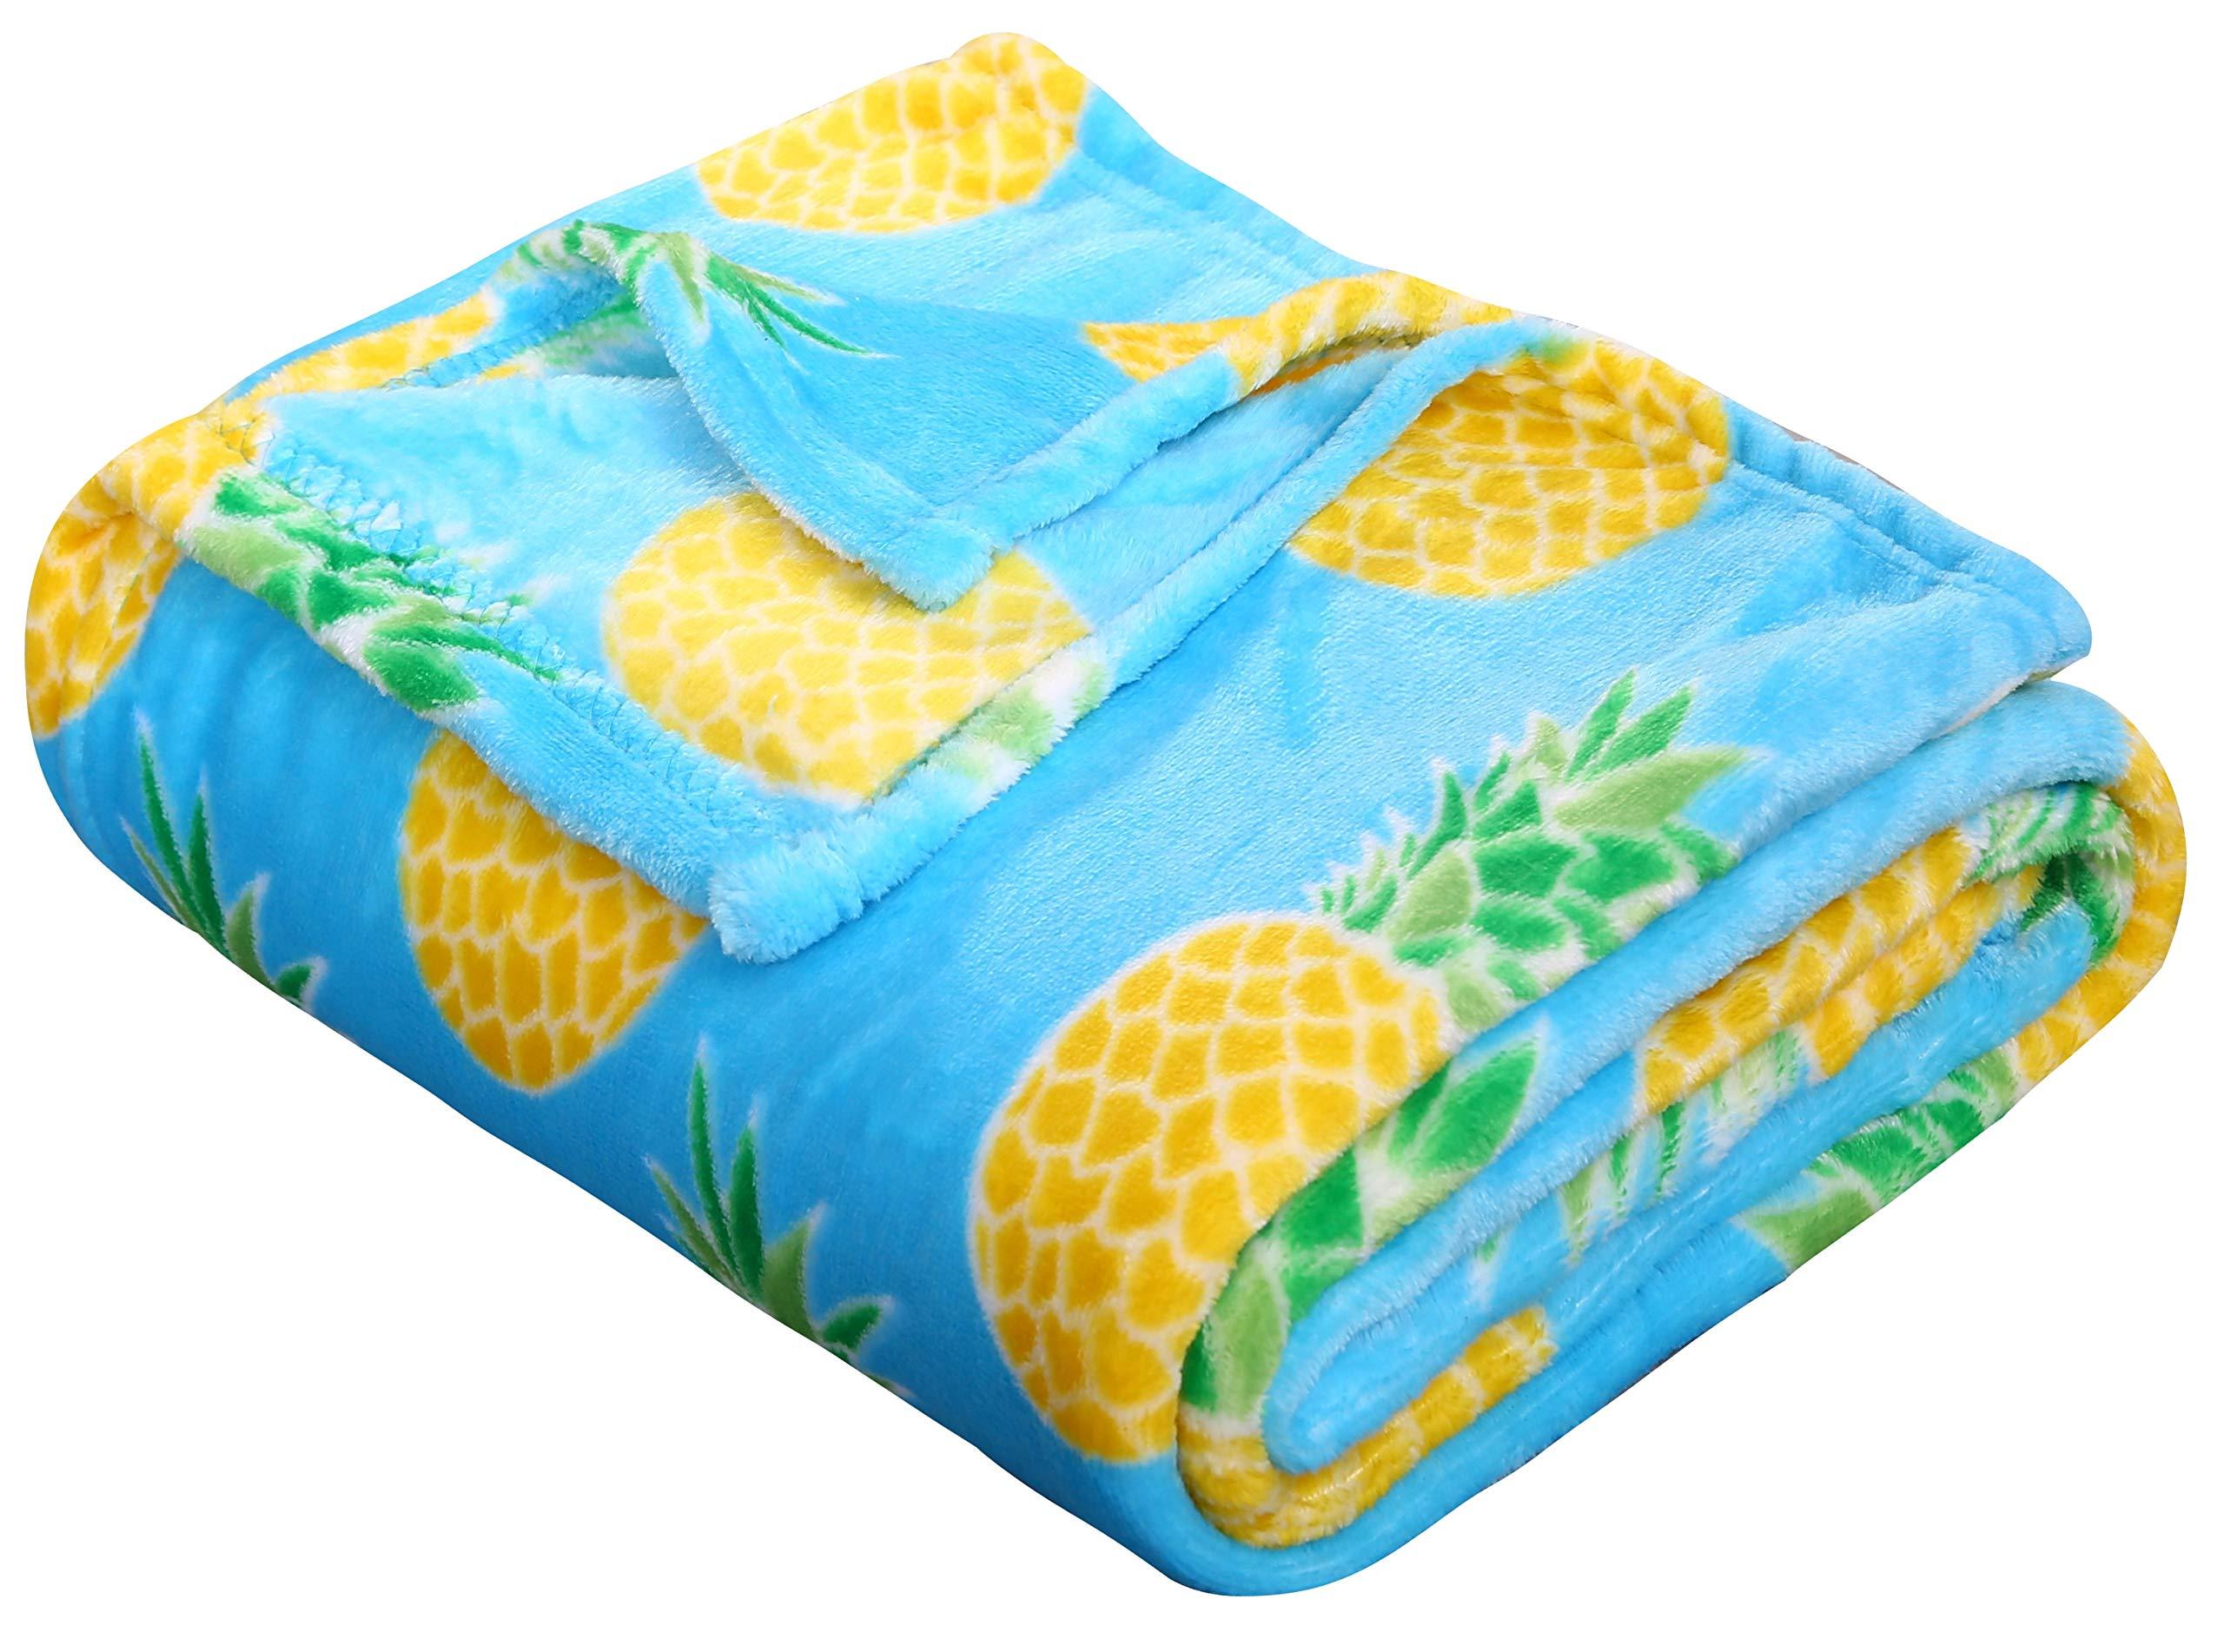 SummerTime Whimsy Plush Fleece Throw Blanket (50'' x 60'') - Pineapple by Décor&More (Image #3)